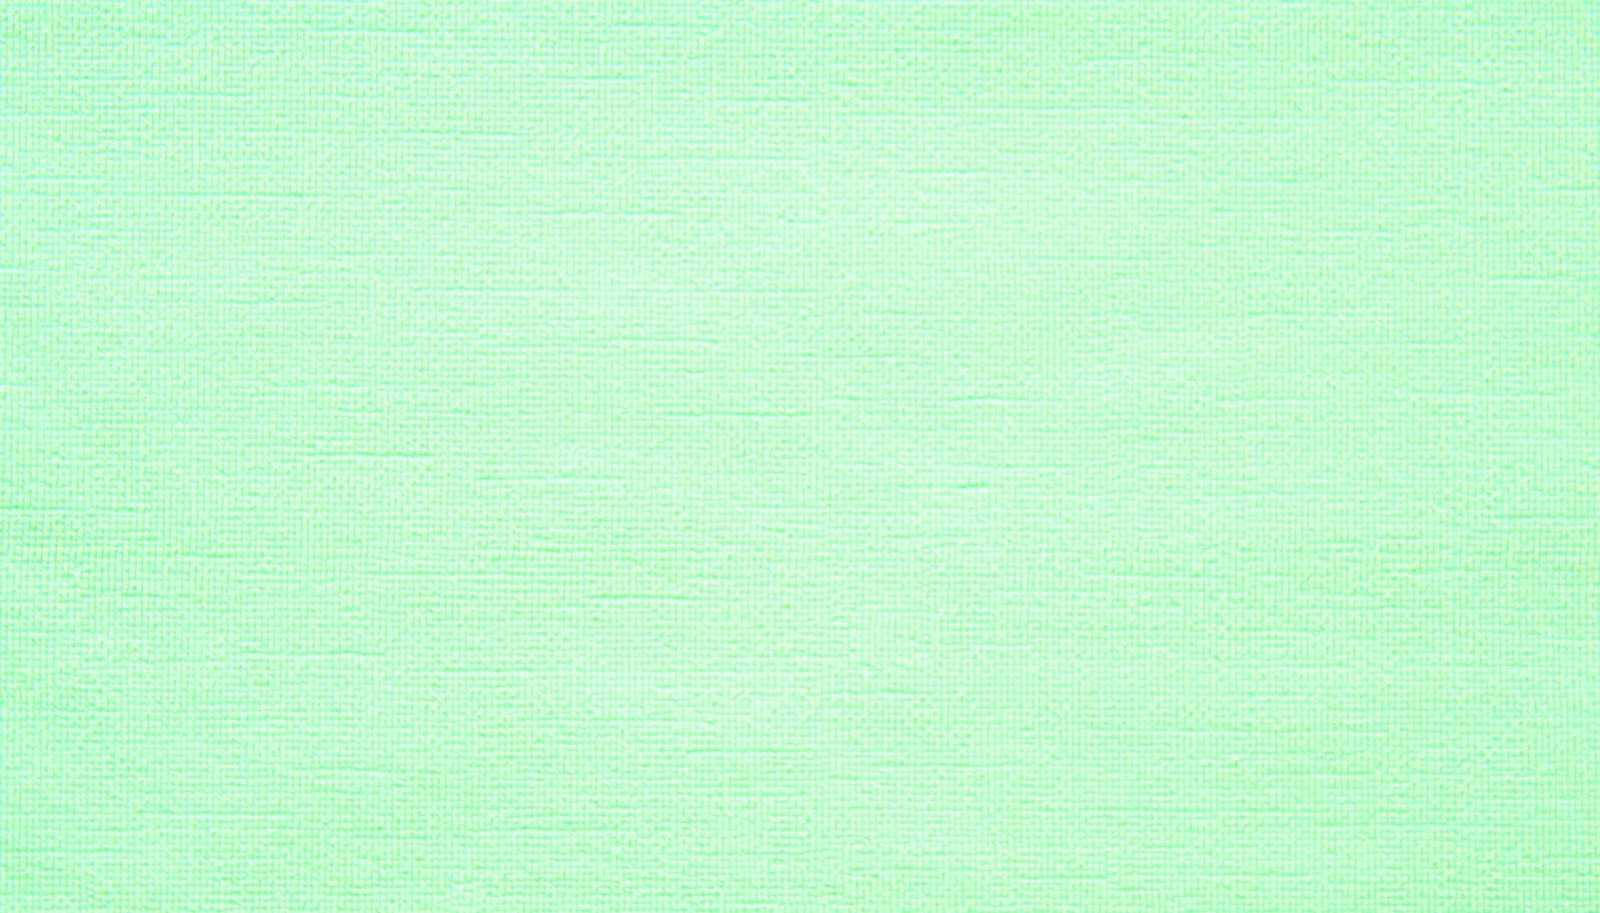 Mint Green Wallpapers Wallpaper Cave